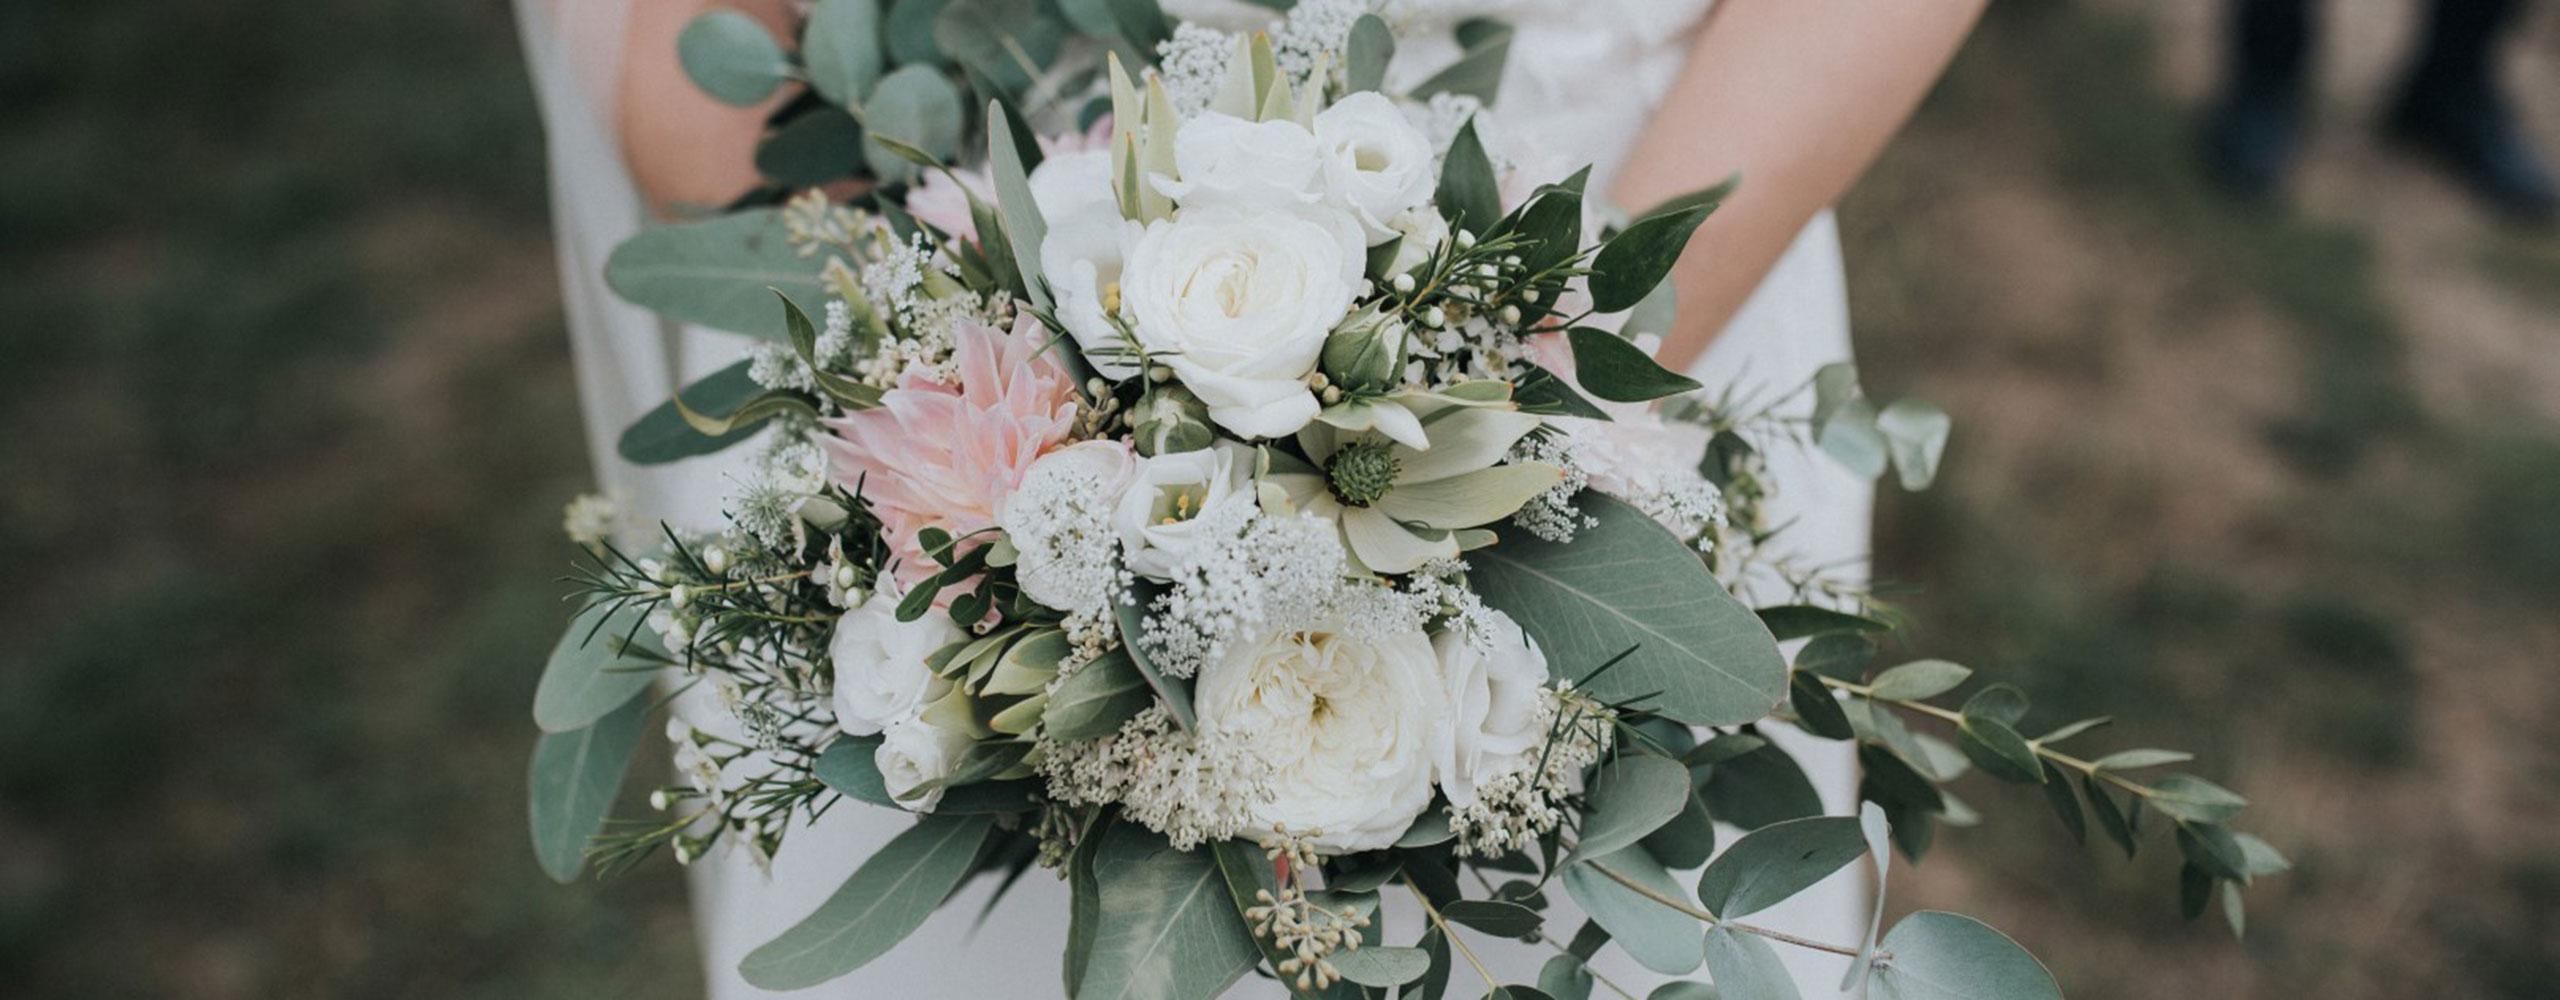 Brautrauss weiss mit rosa Dahlien und Eucalyputs - Kerstin Adrian Floristin